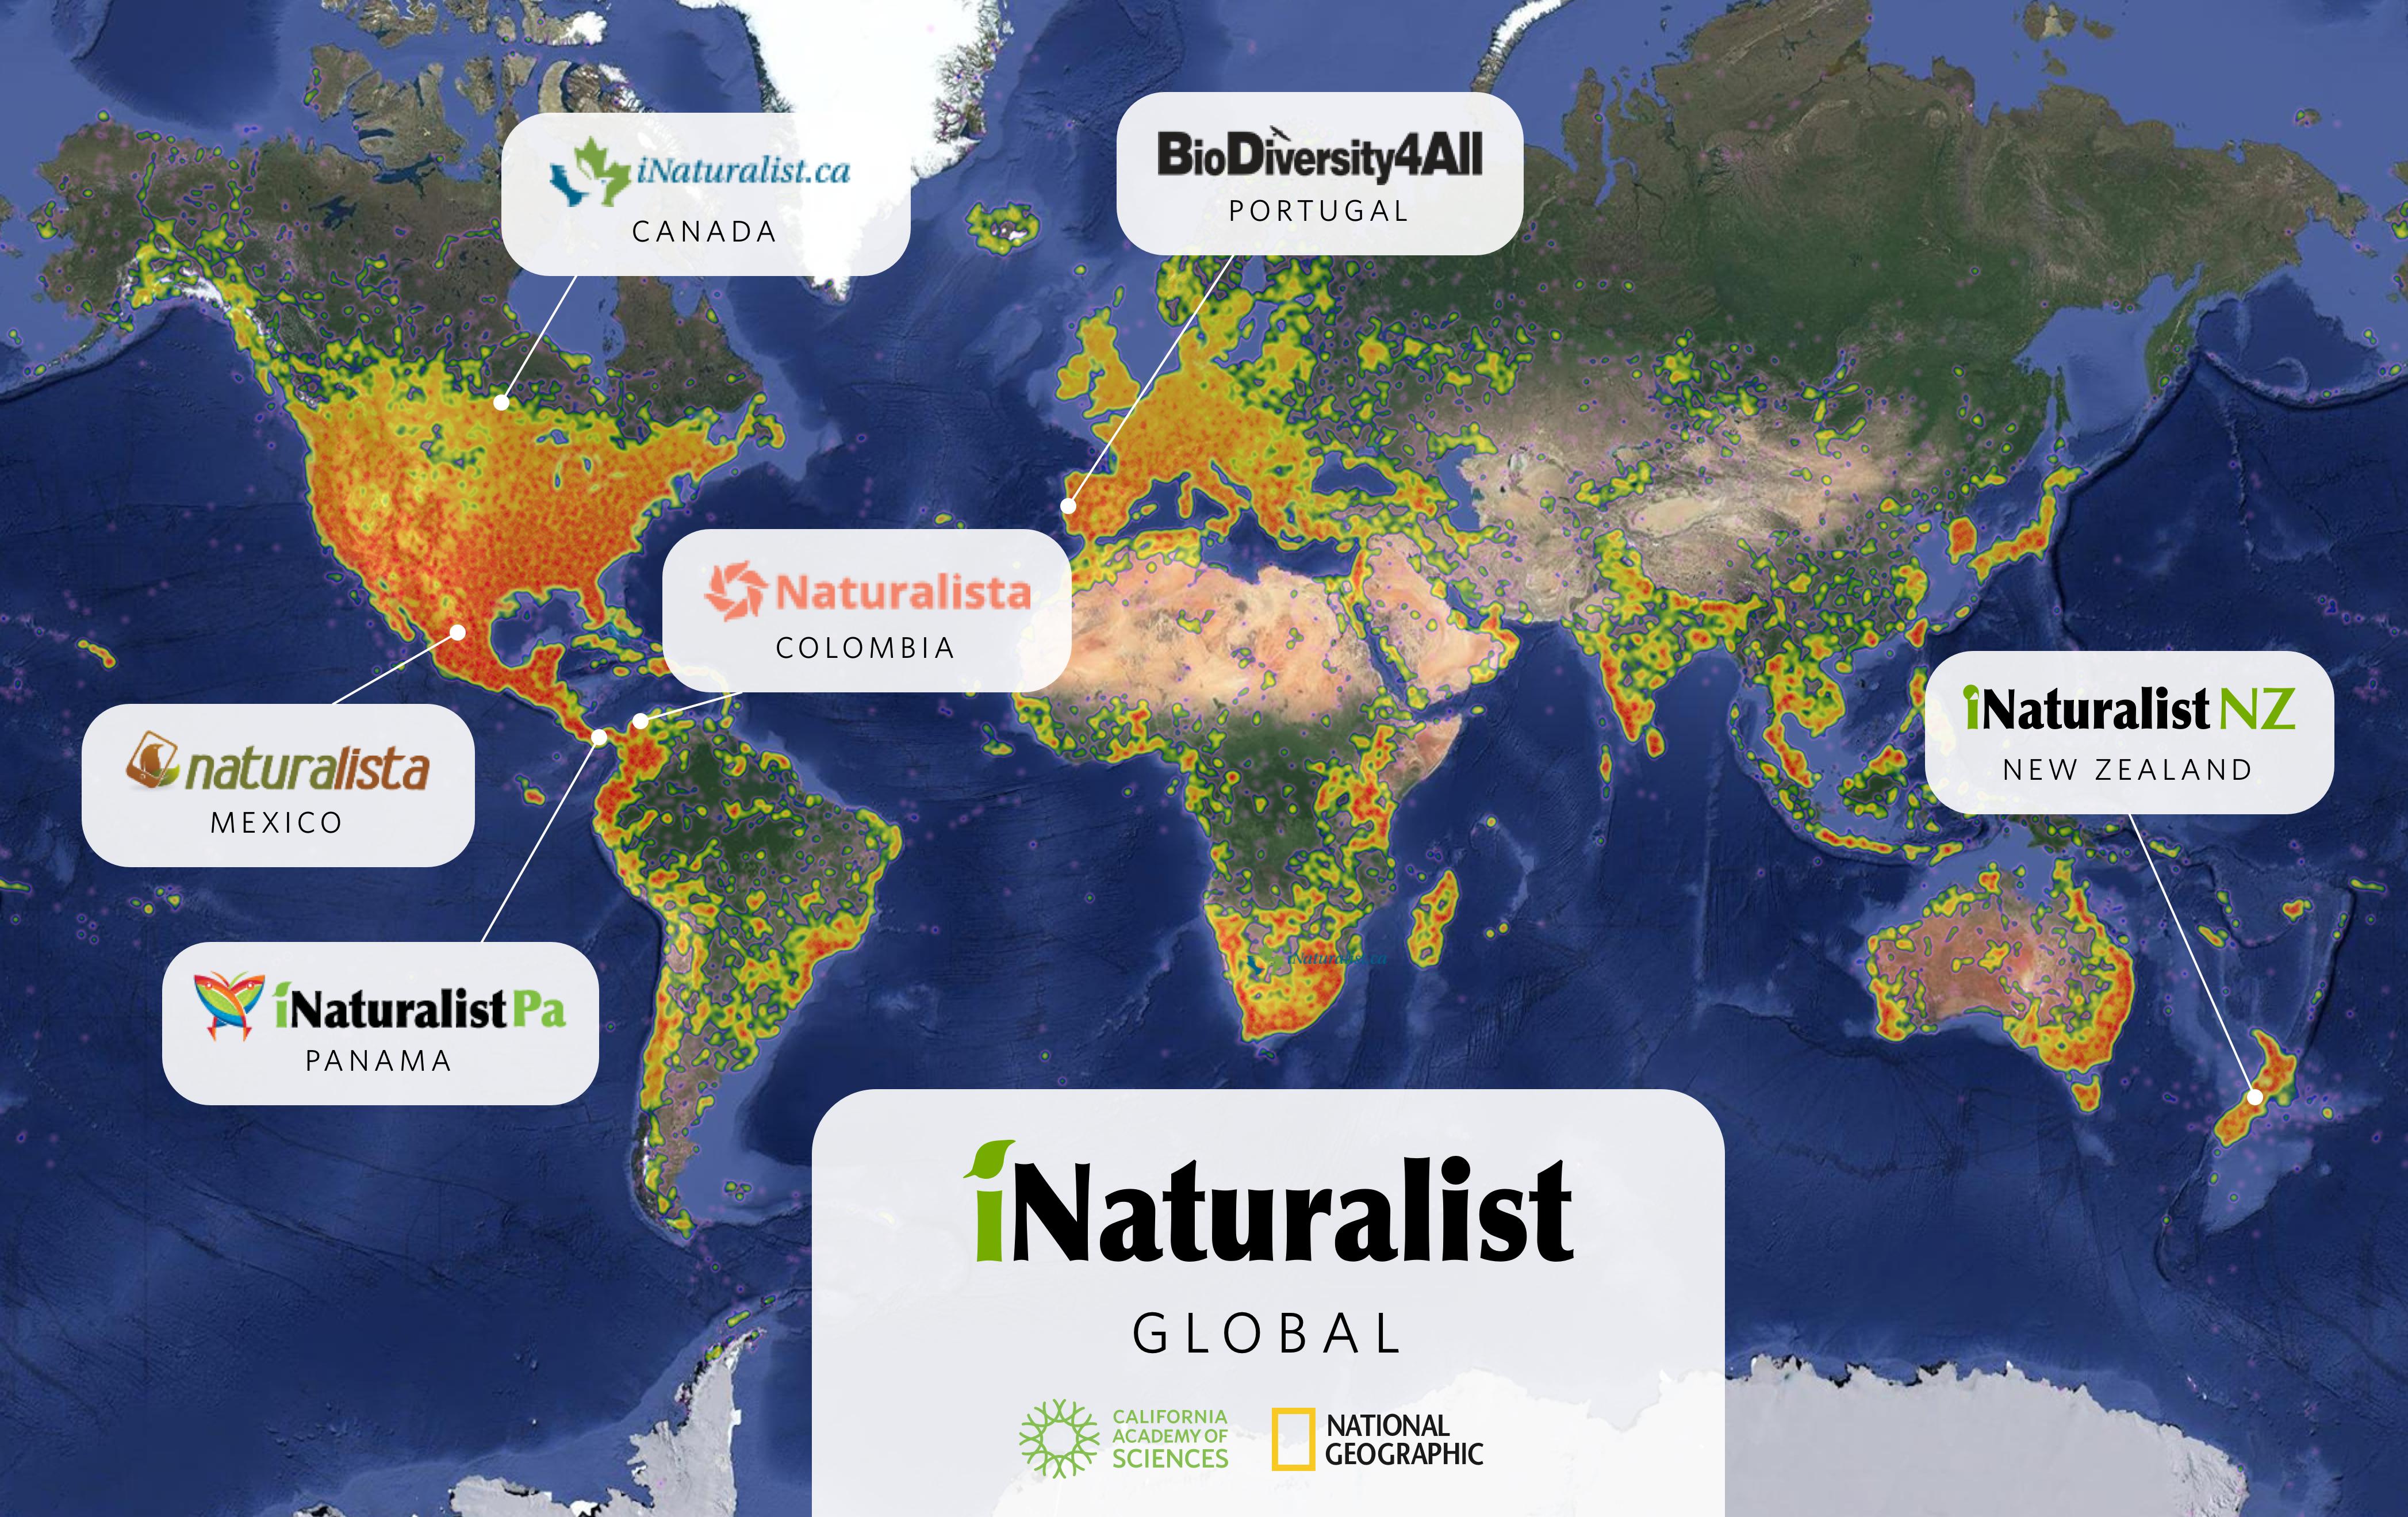 iNaturalist Network · BioDiversity4All